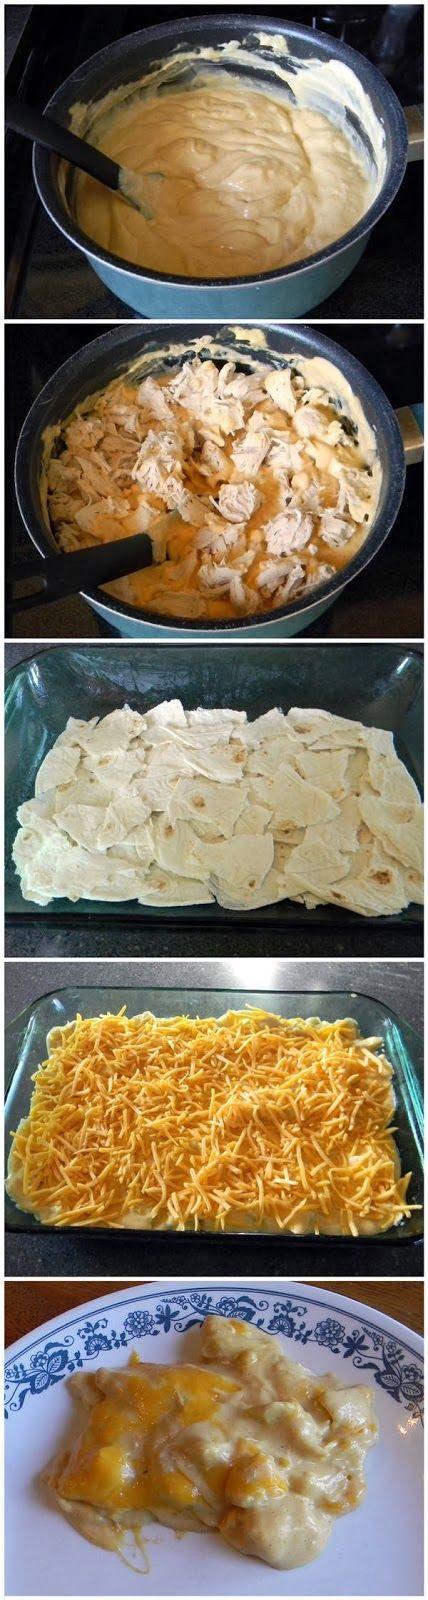 ... Pinterest | Chicken Taco Casserole, Chicken Tacos and Taco Casserole